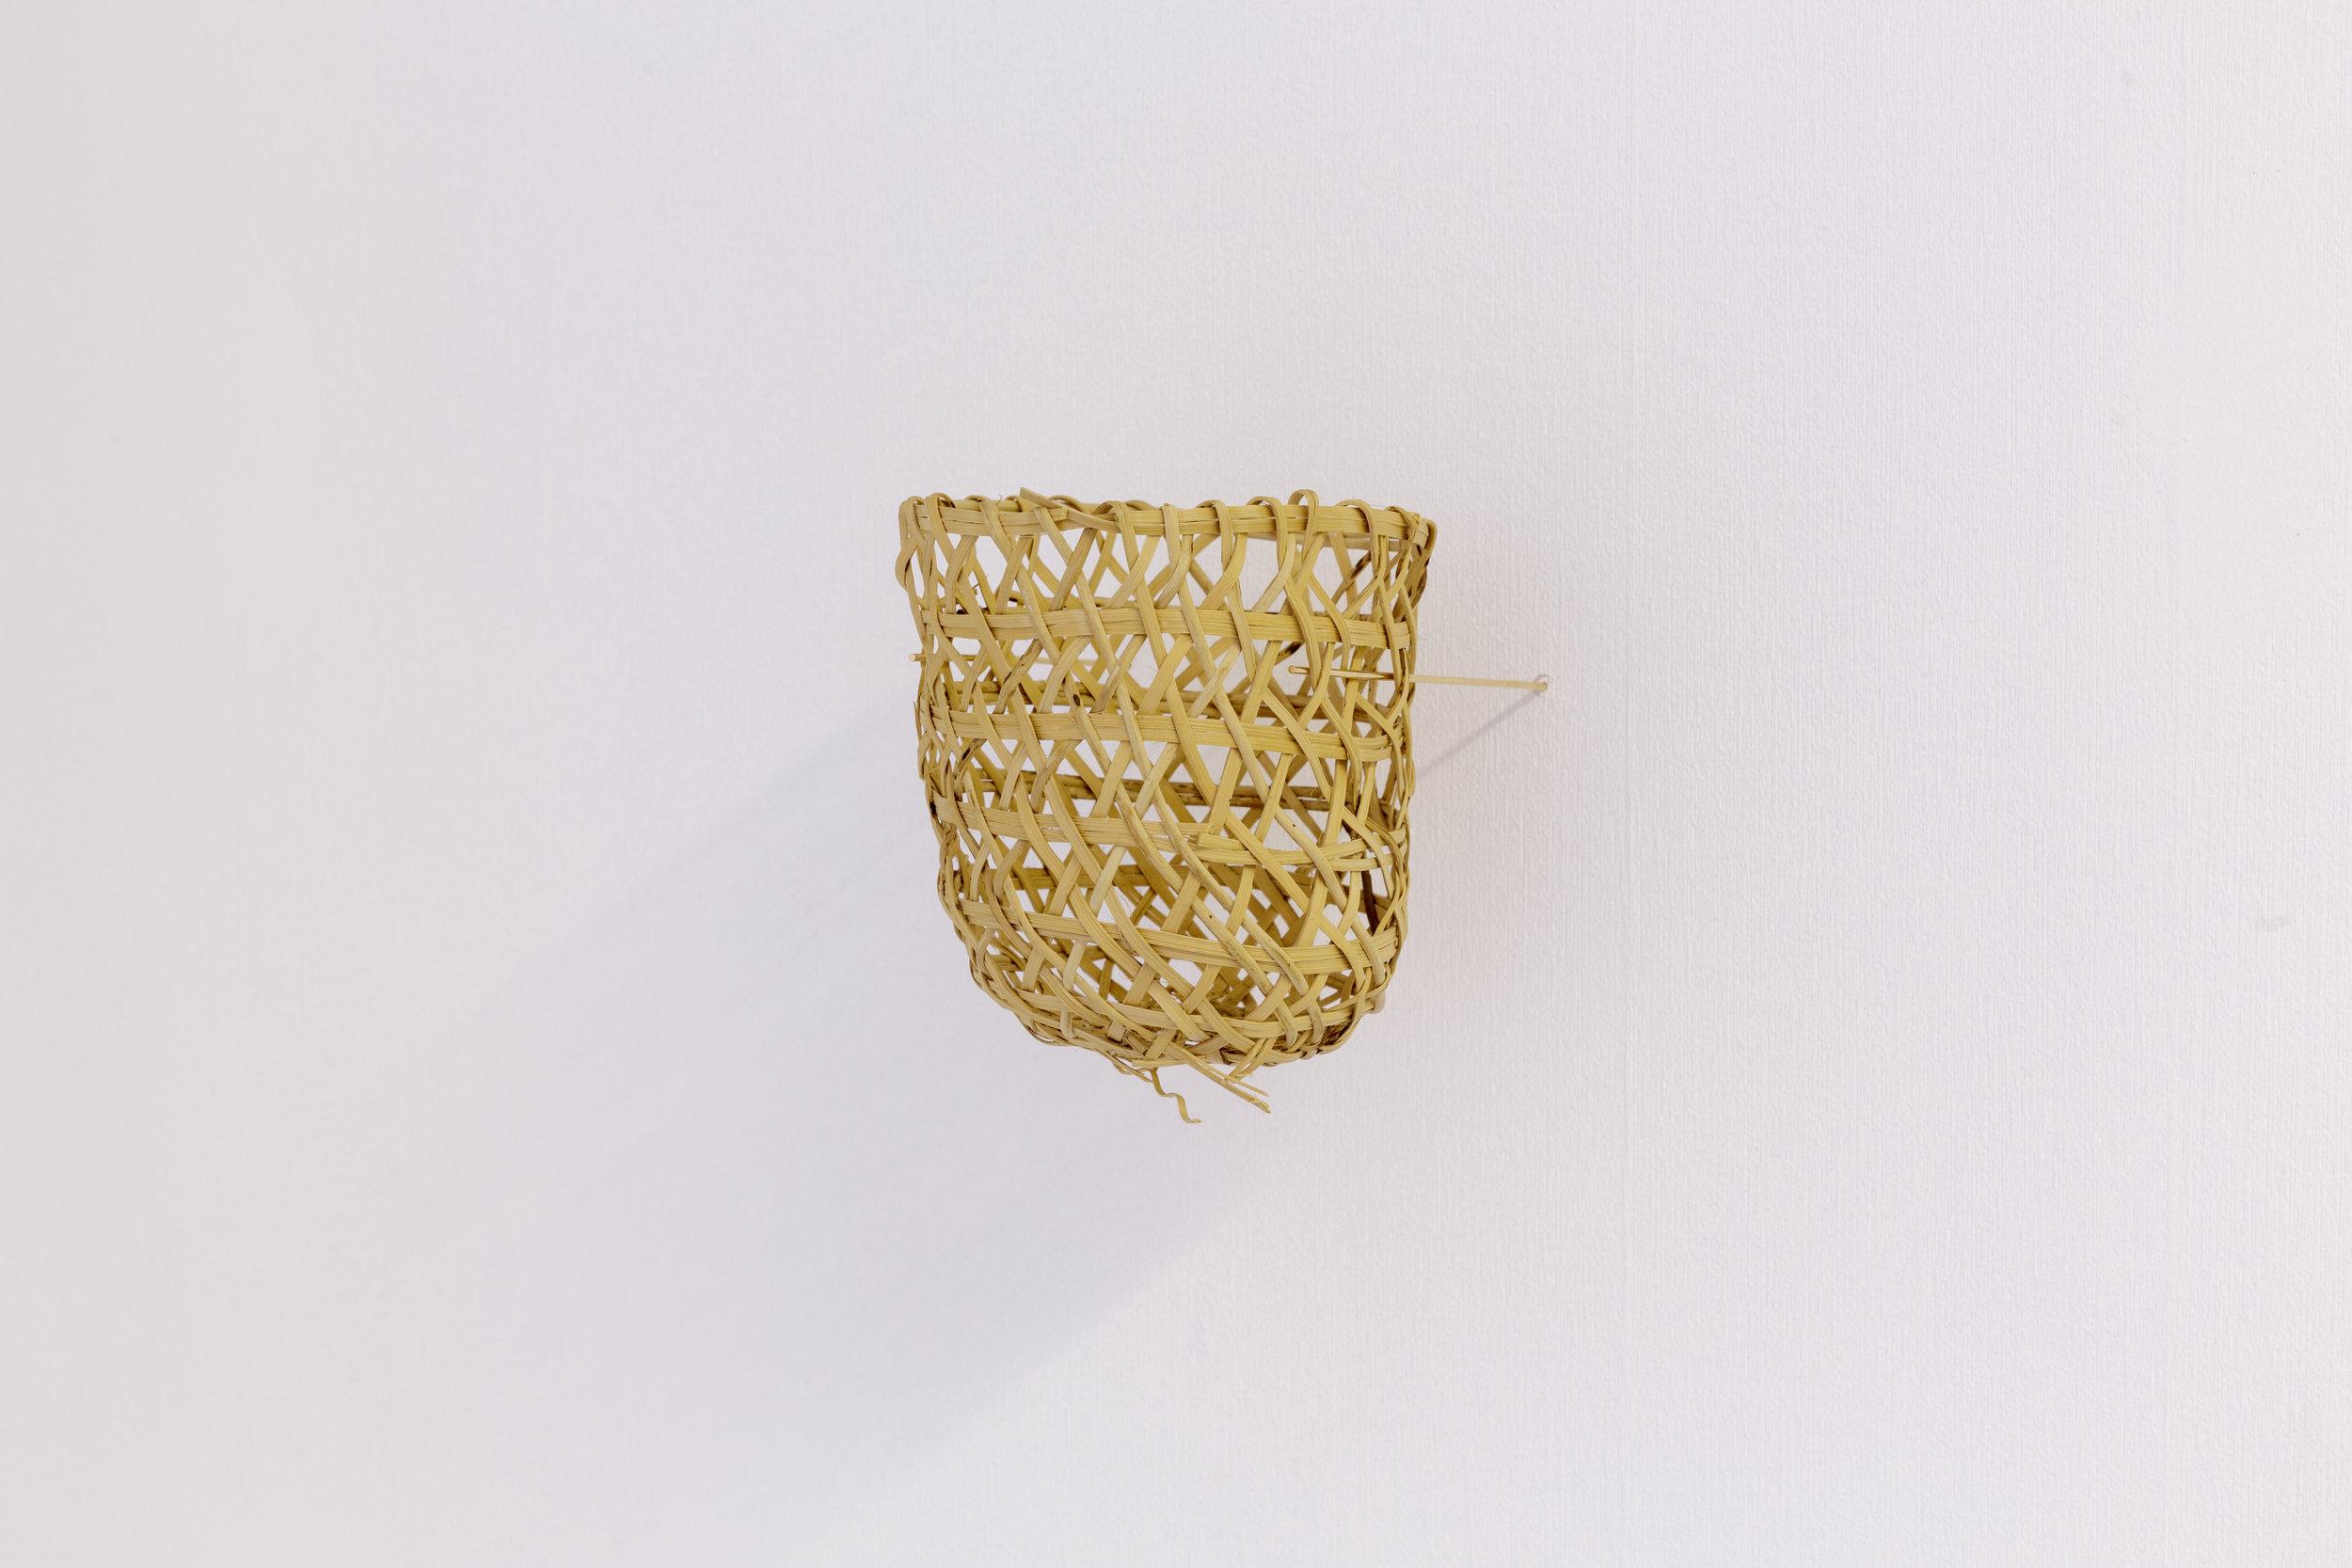 Joana Escoval, Untitled, 2014. Gold, Naso-Teribe basket. Photo: Tim Bowditch.